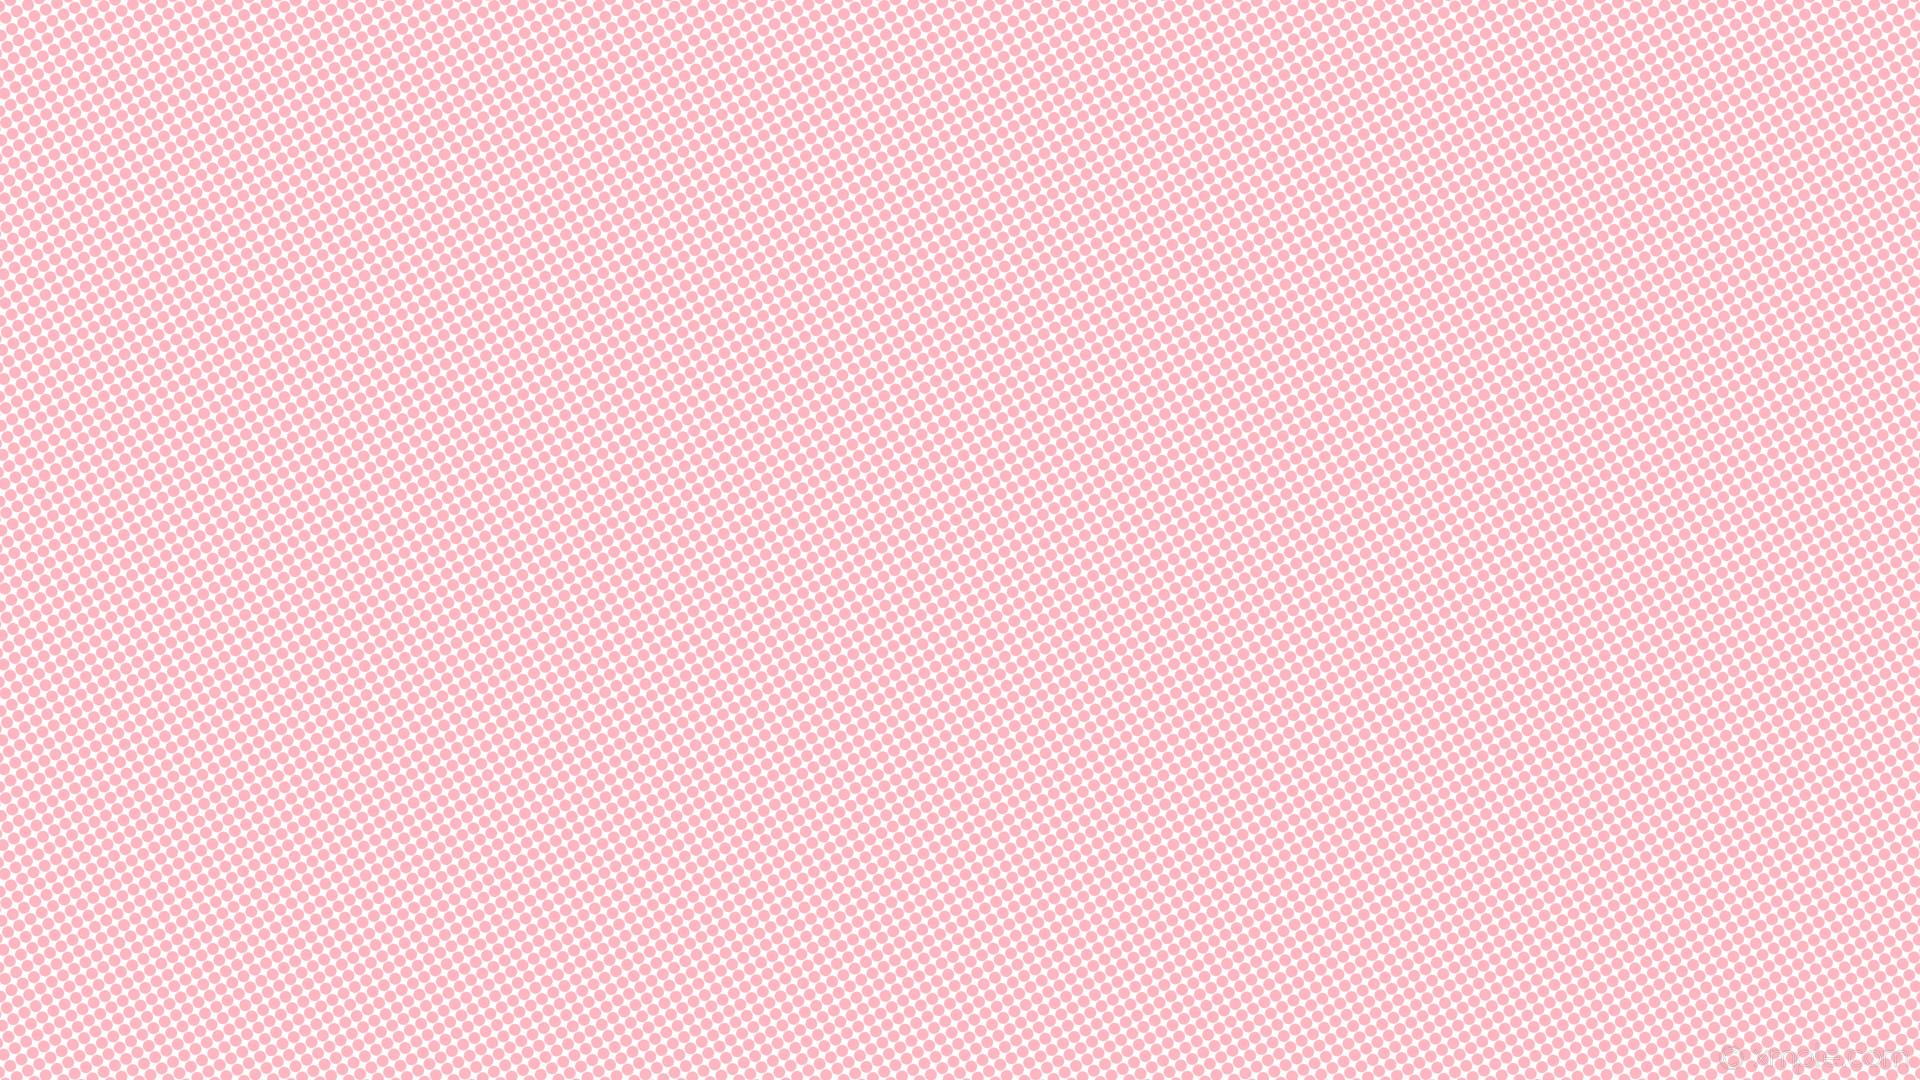 Res: 1920x1080, wallpaper white polka pink spots dots light pink #ffffff #ffb6c1 120° 12px  13px